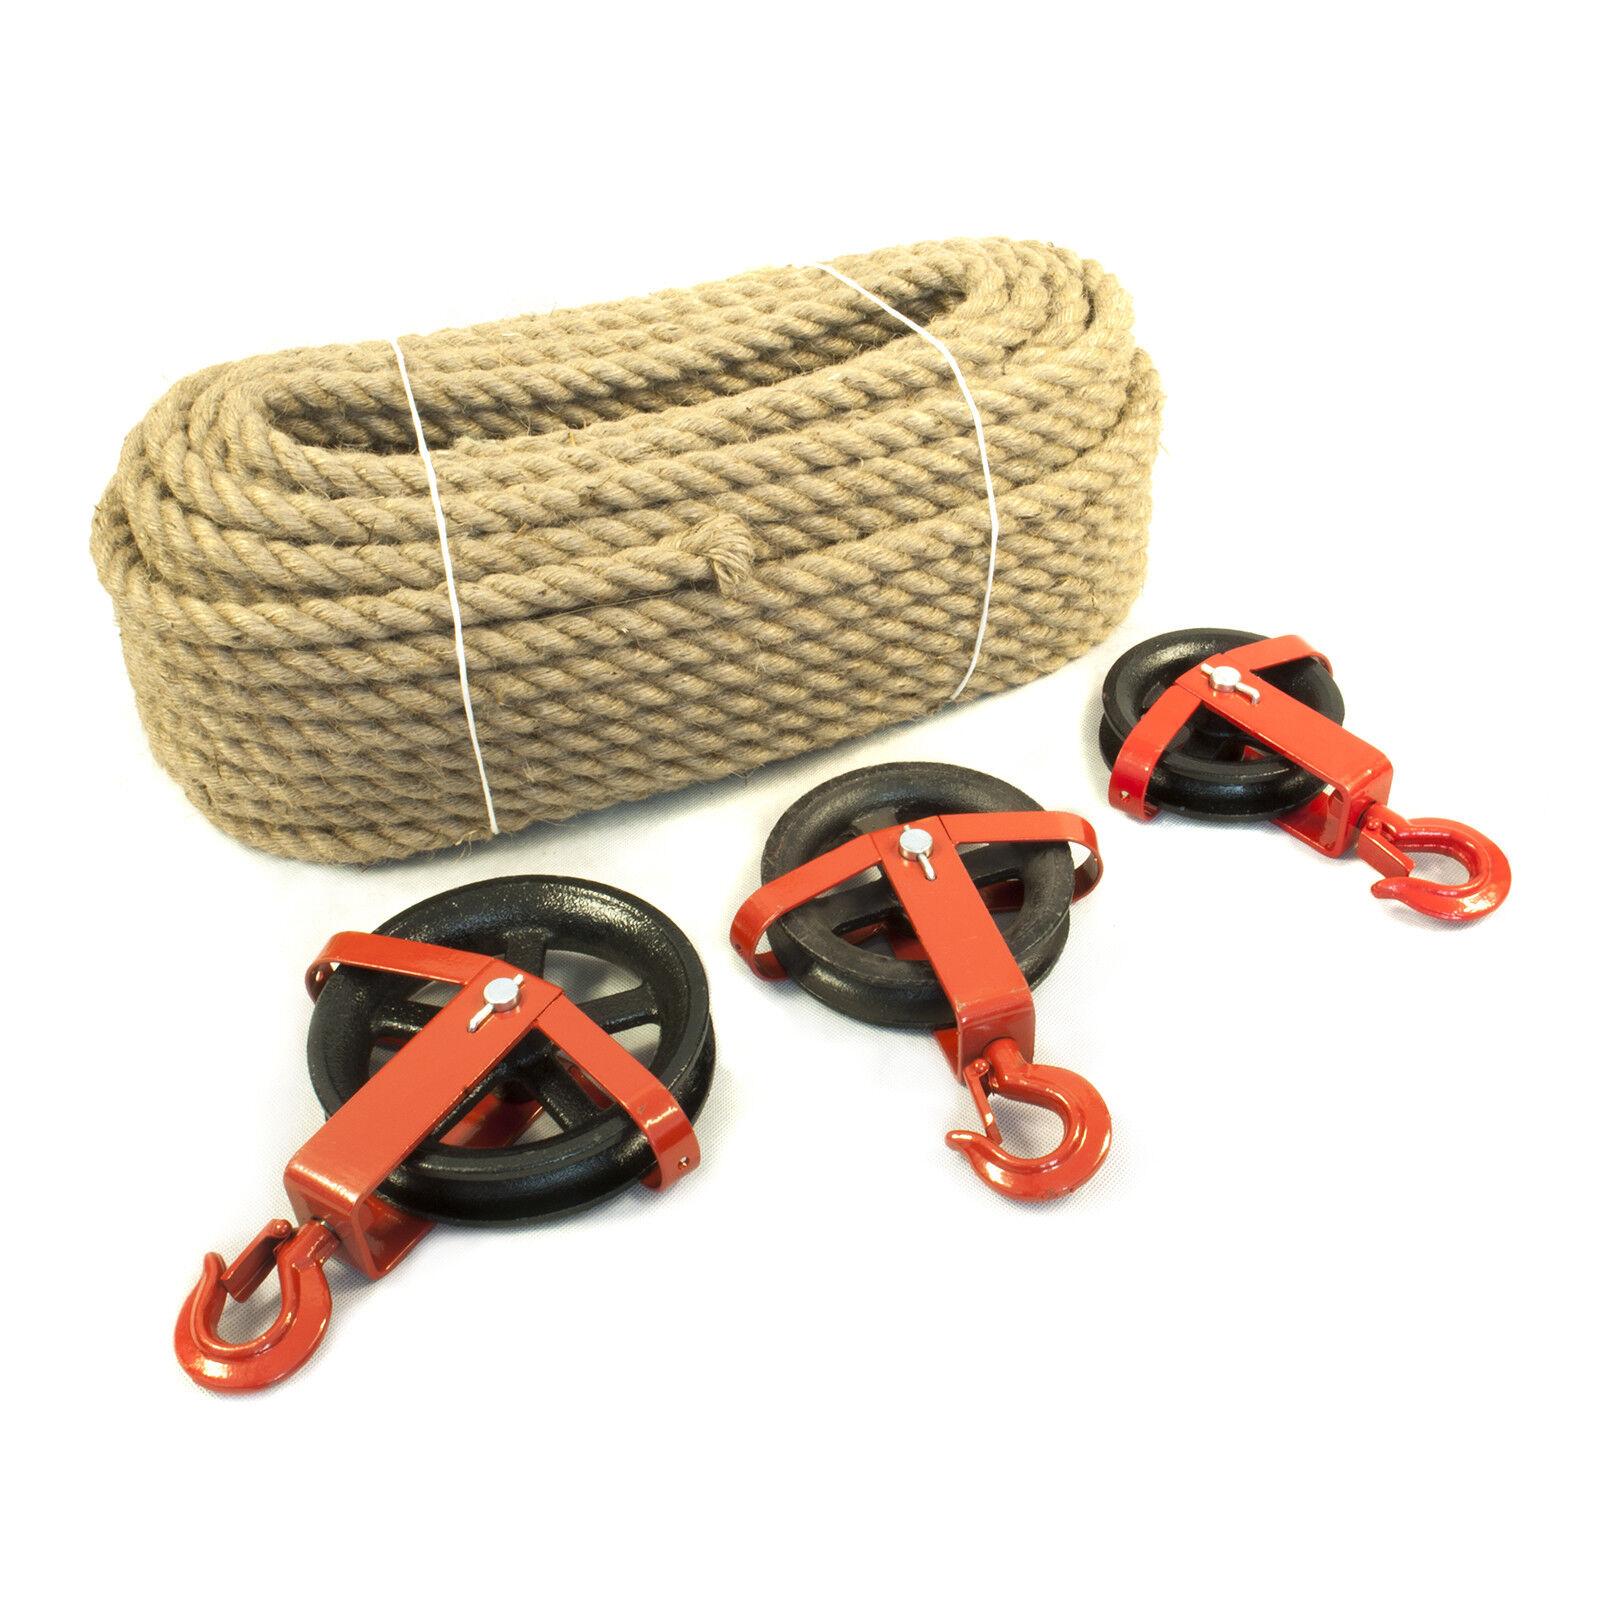 SET JUTESEIL+ UMLENKROLLE mit Haken Seilwinde Seilzug Seilrolle Windenrolle Seil